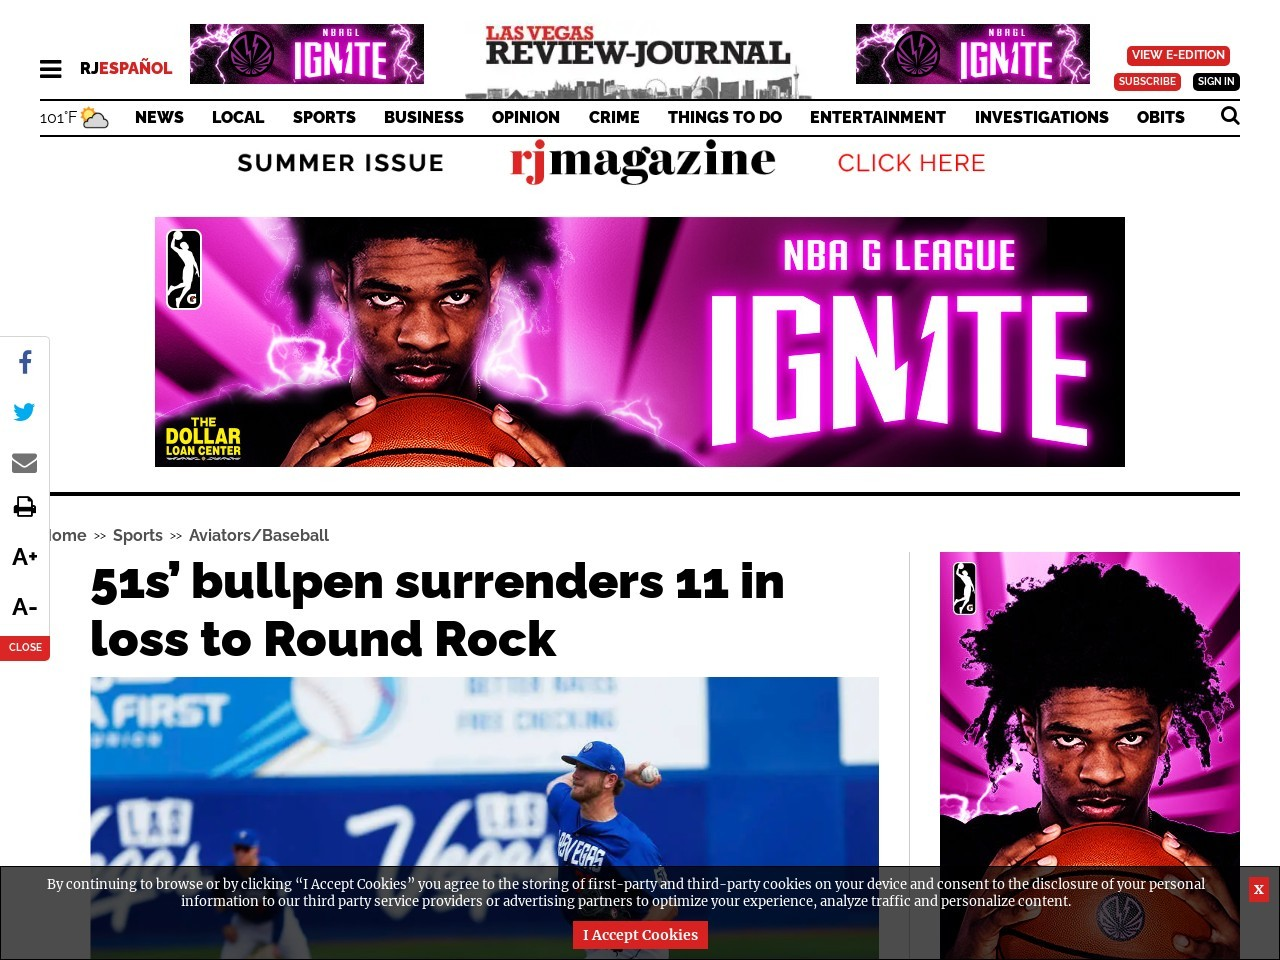 51s' bullpen surrenders 11 in loss to Round Rock